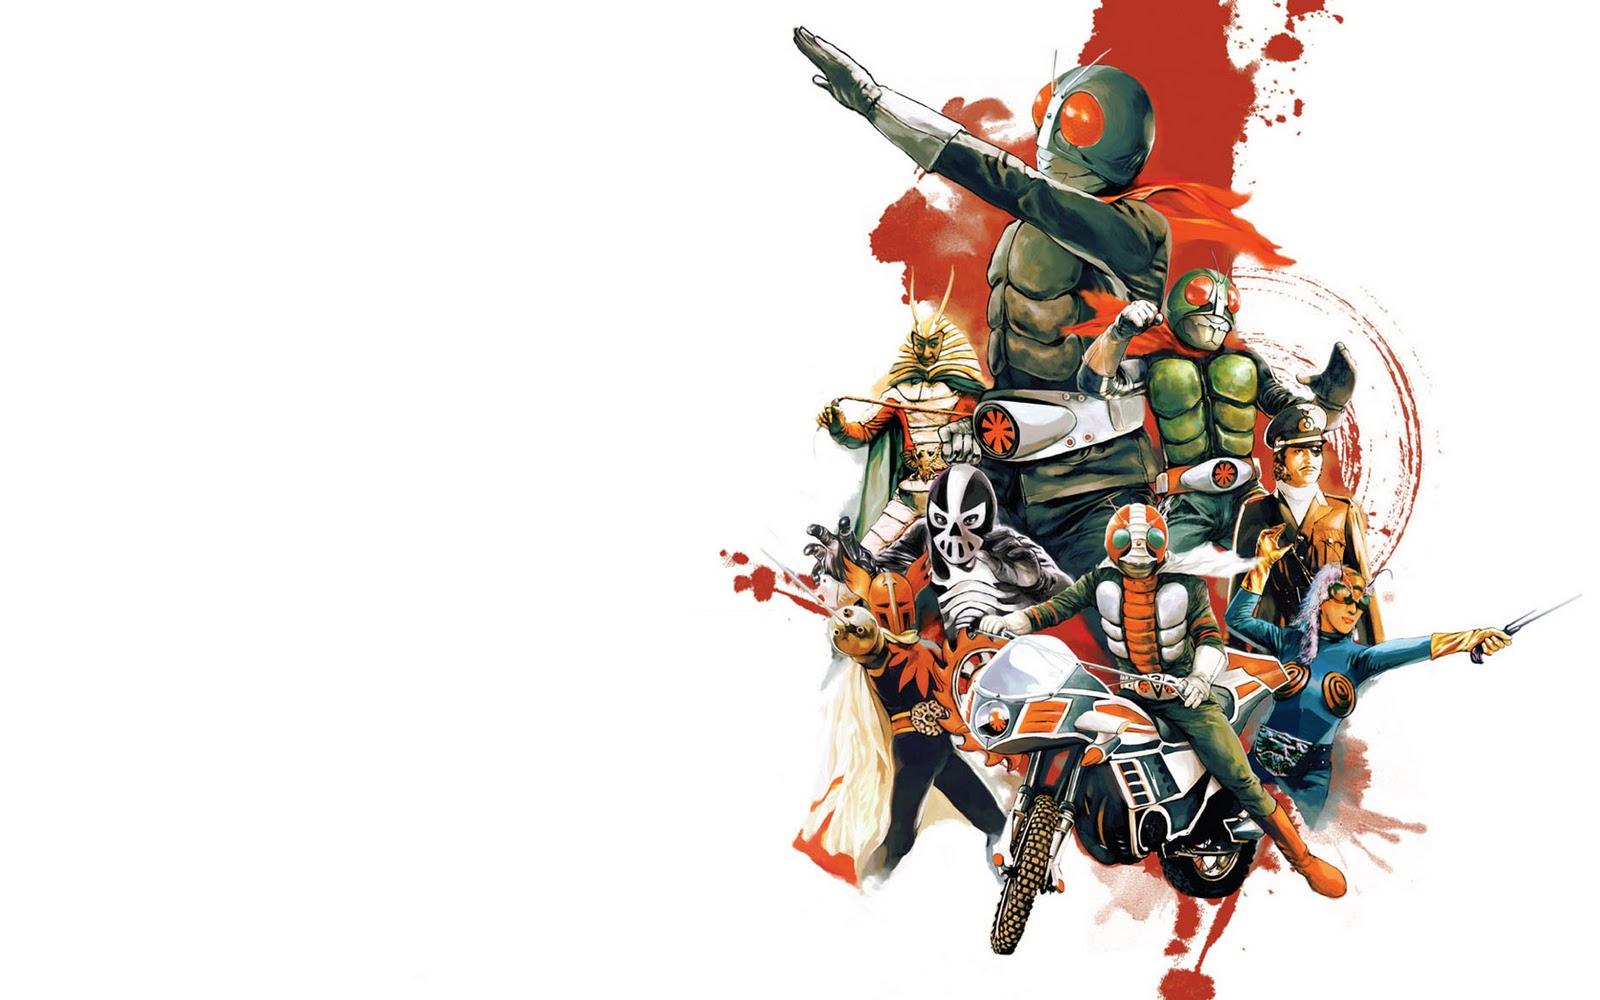 henshin and rollout kamen rider wallpaper